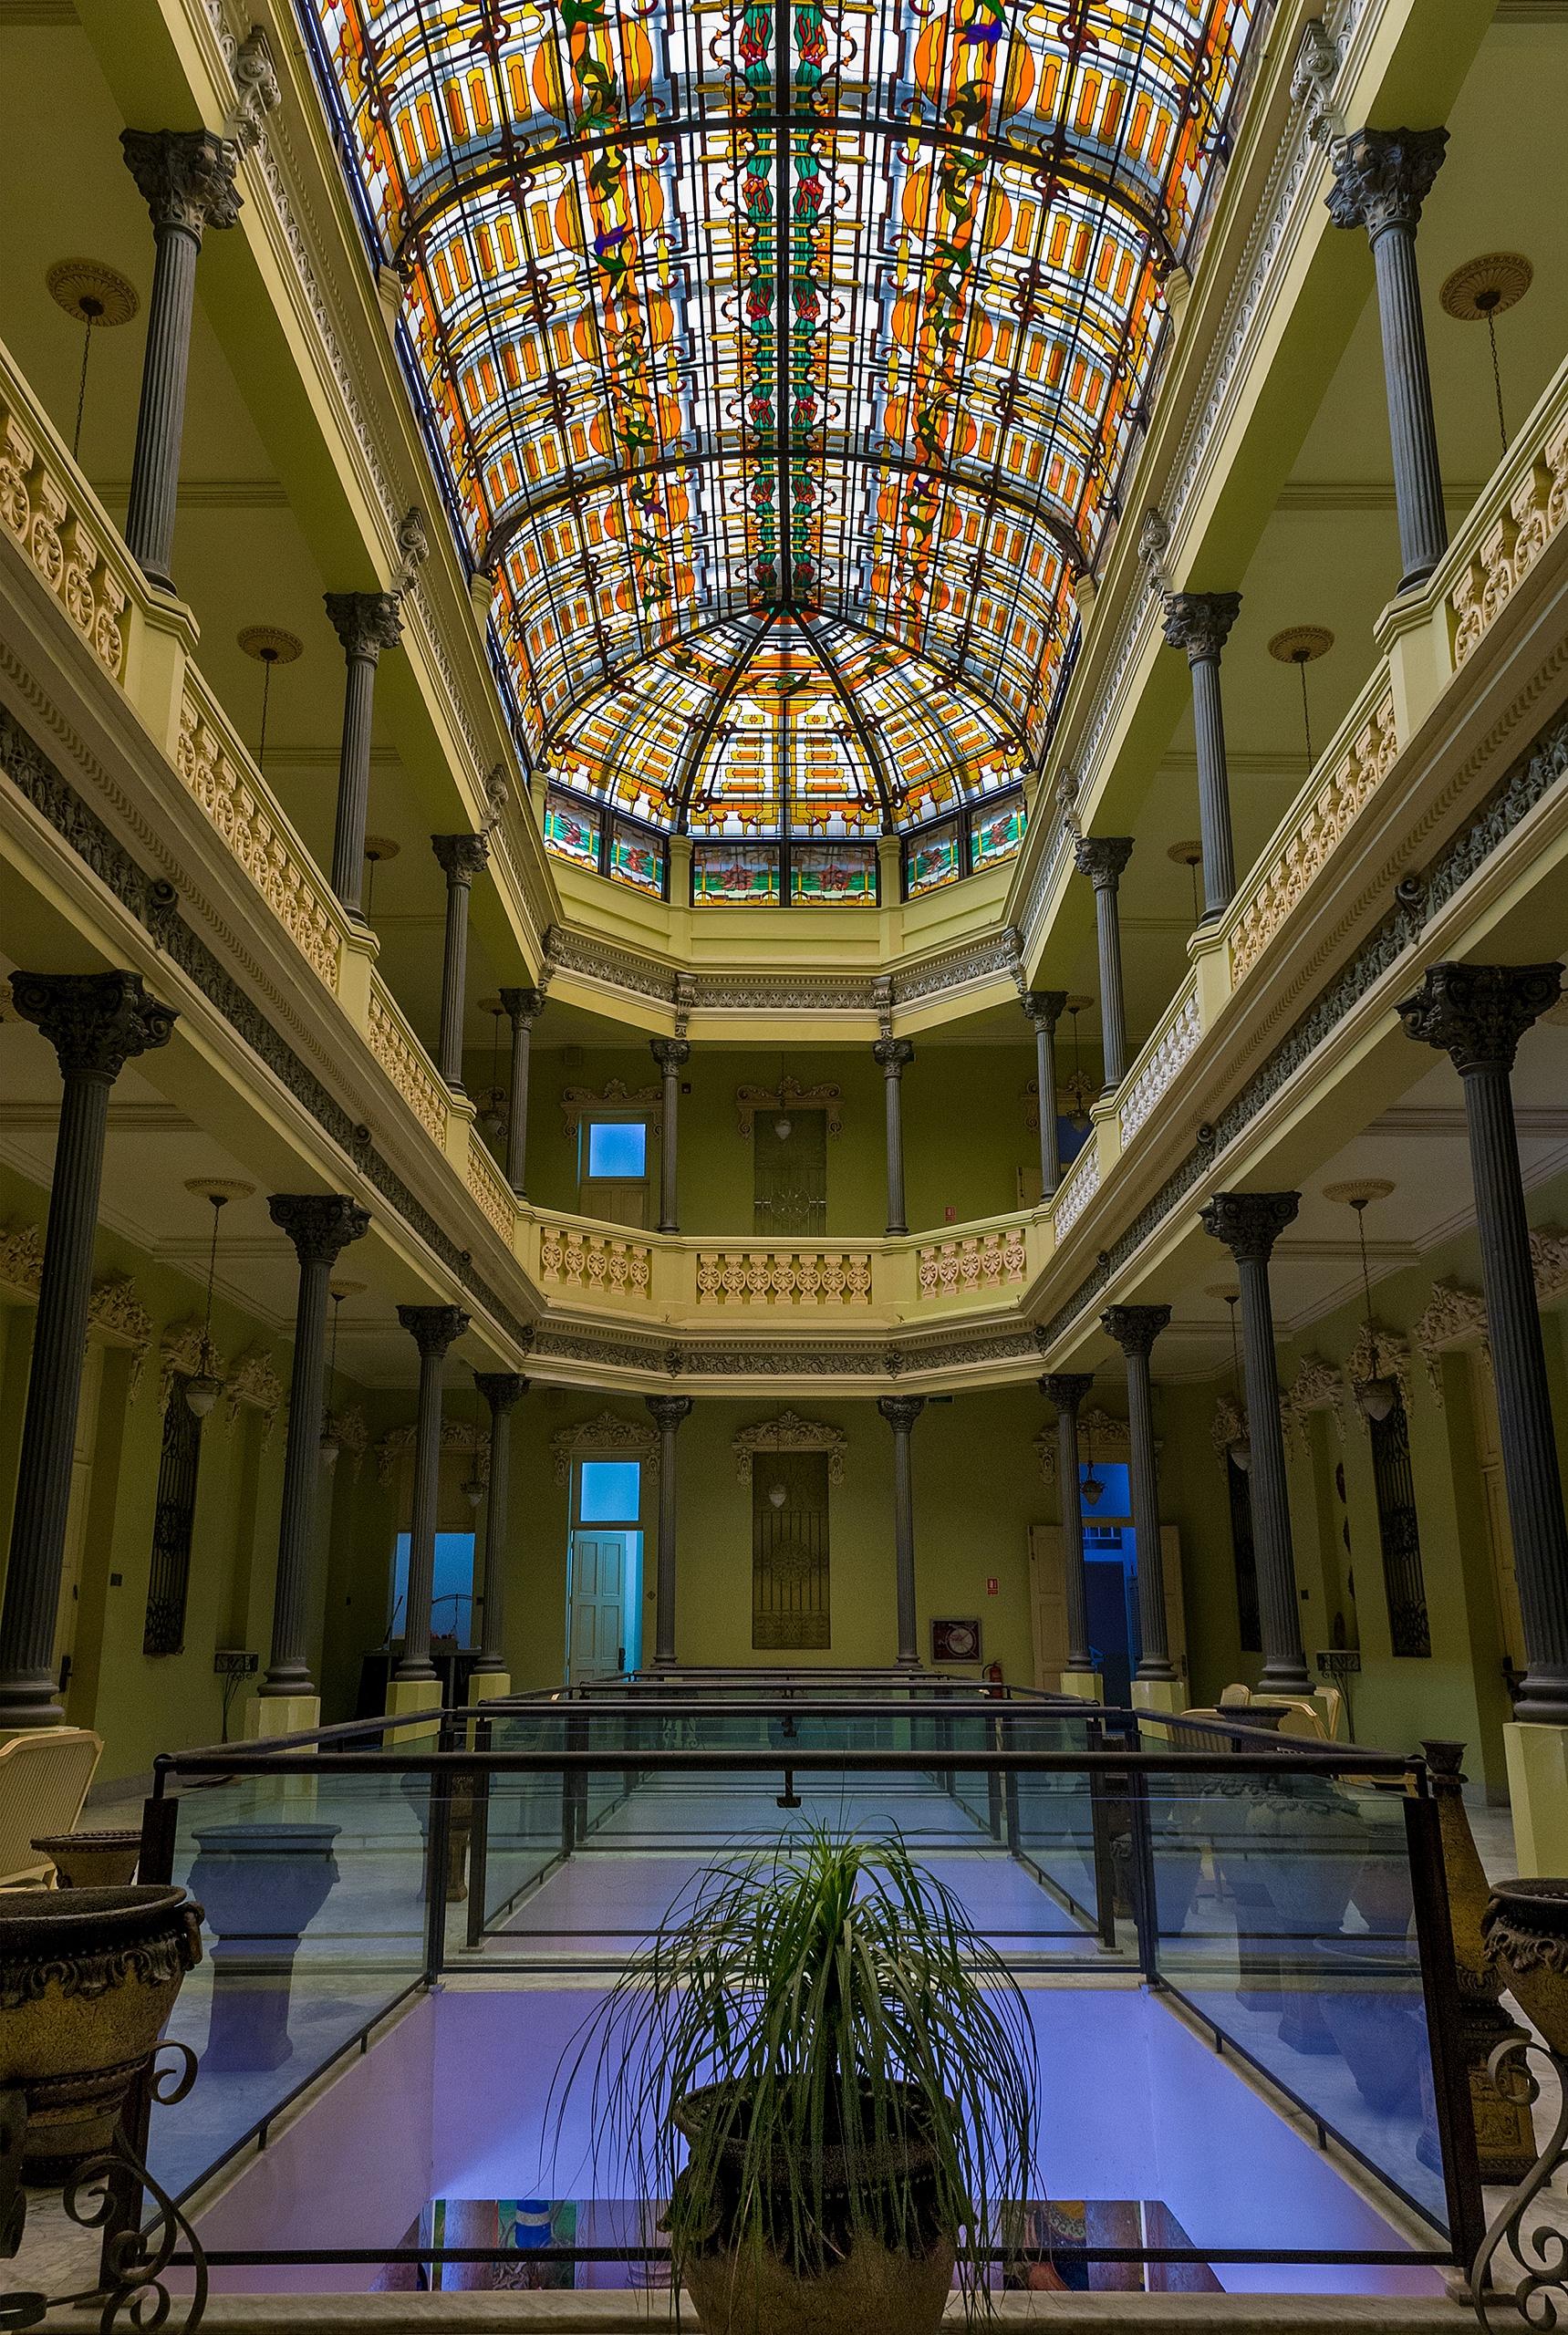 Belle Etage skylight - Habana, Cuba - christofkessemeier | ello